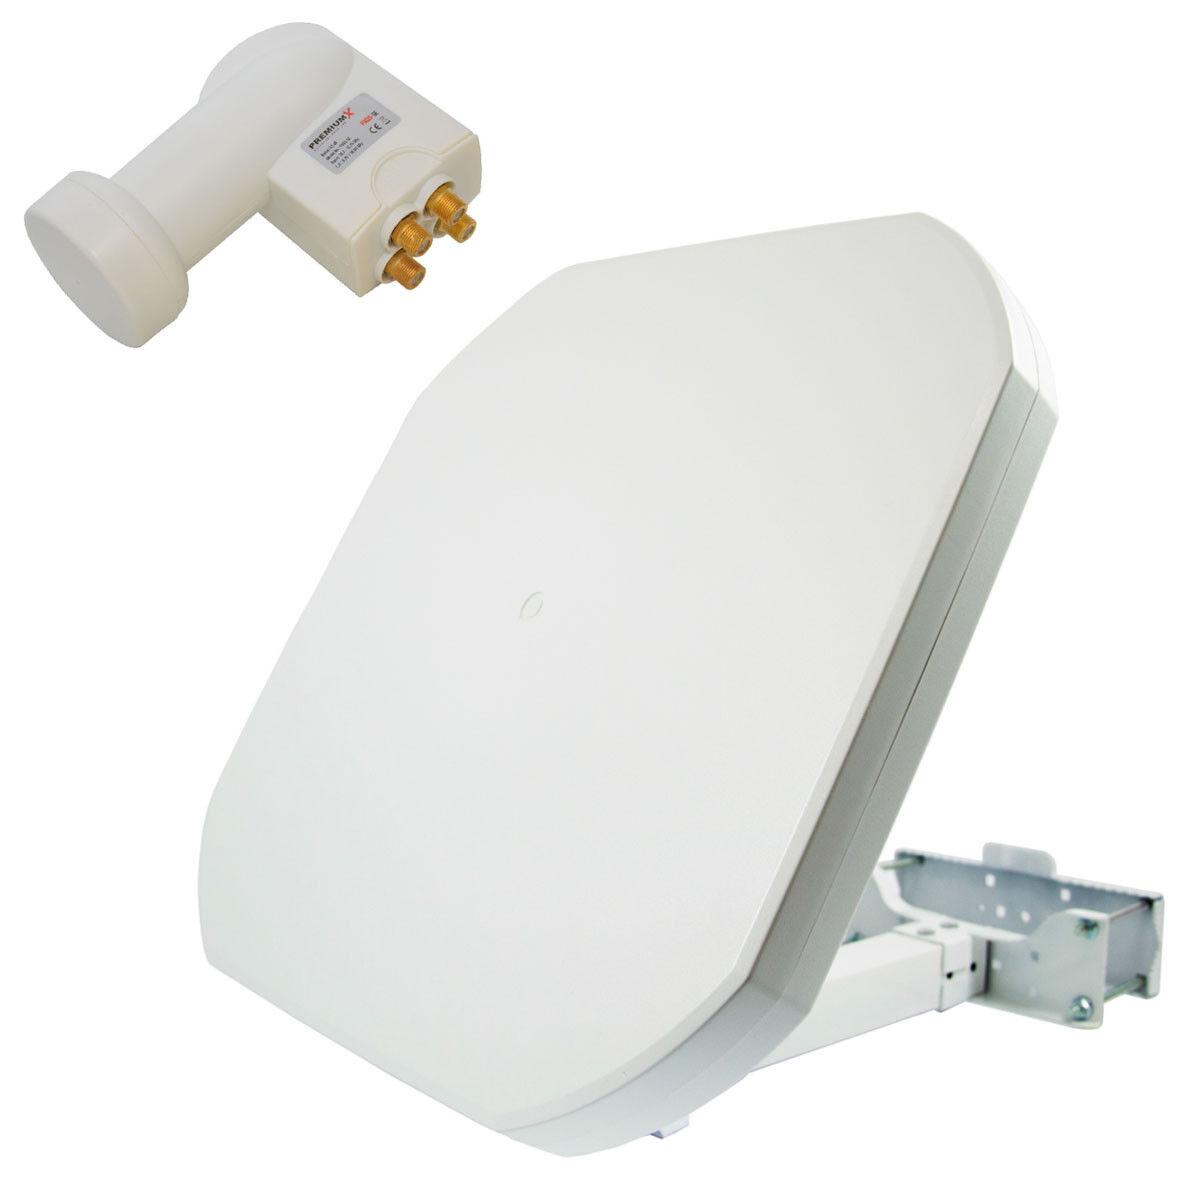 Sat Flachantenne Digital Quad LNB Satellitenanlage 4 Teilnehmer 4K UHD Full HD